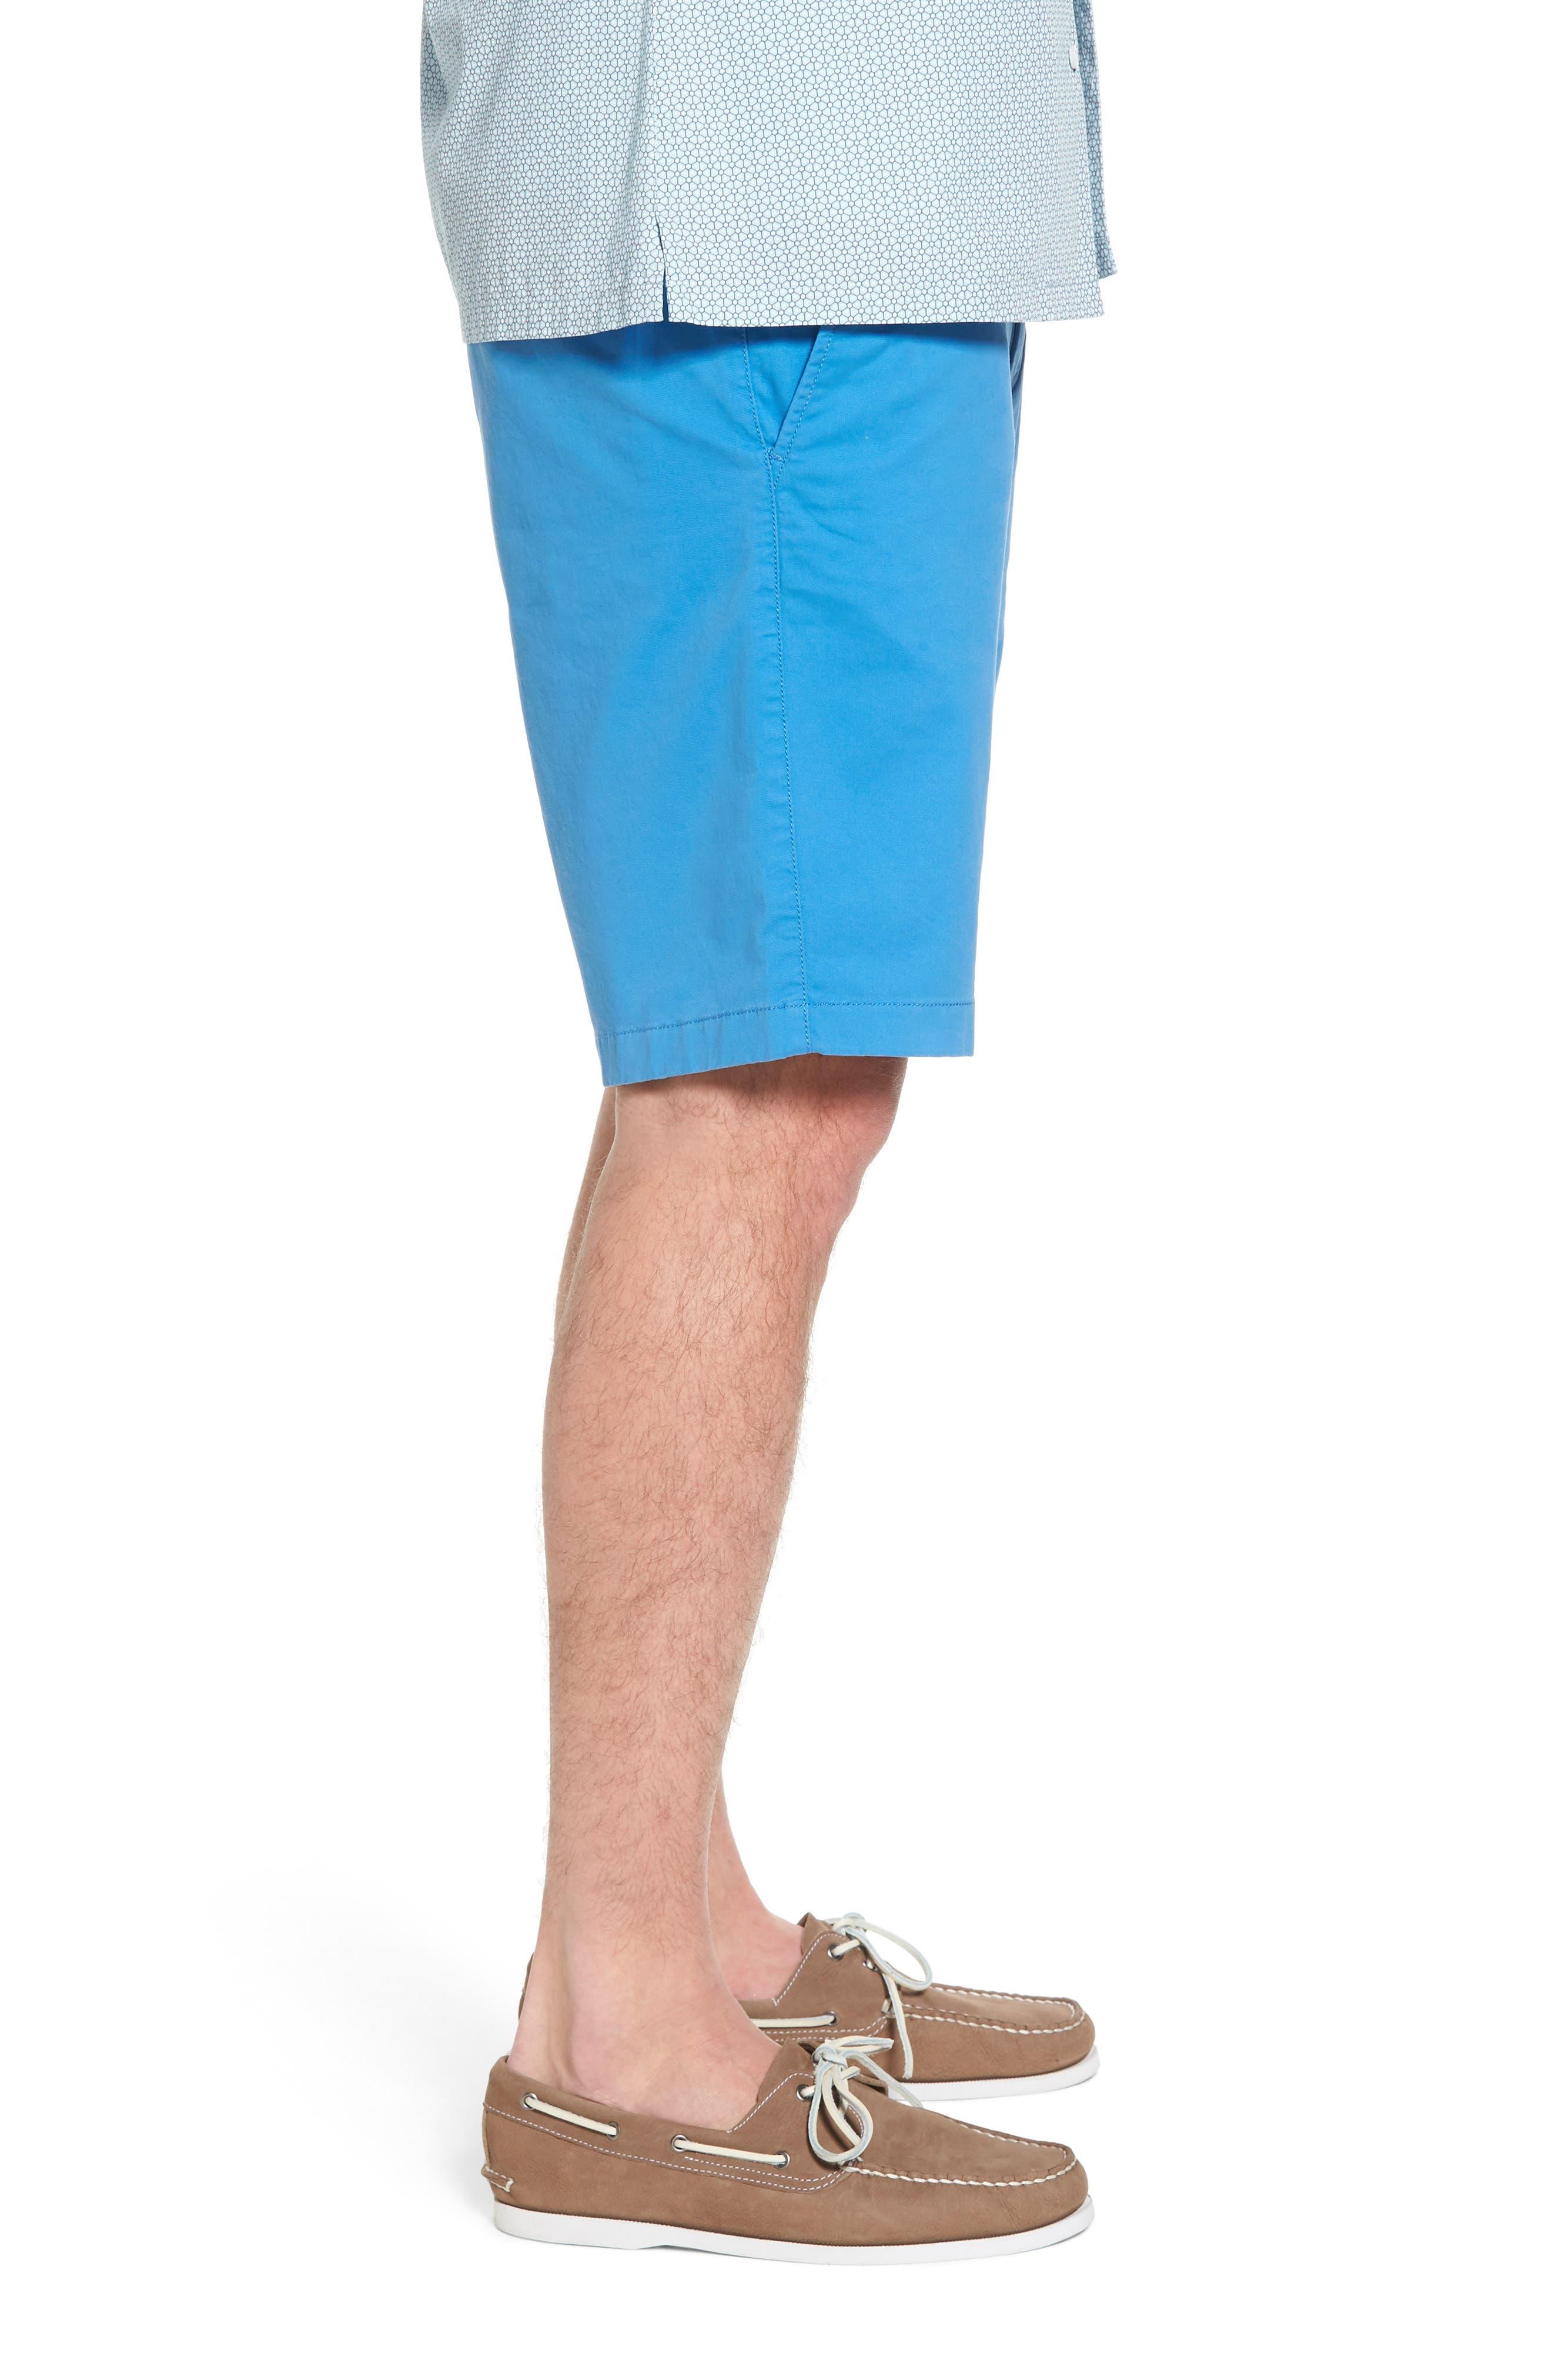 Ballard Slim Fit Stretch Chino 11-Inch Shorts,                             Alternate thumbnail 5, color,                             Blue Camp